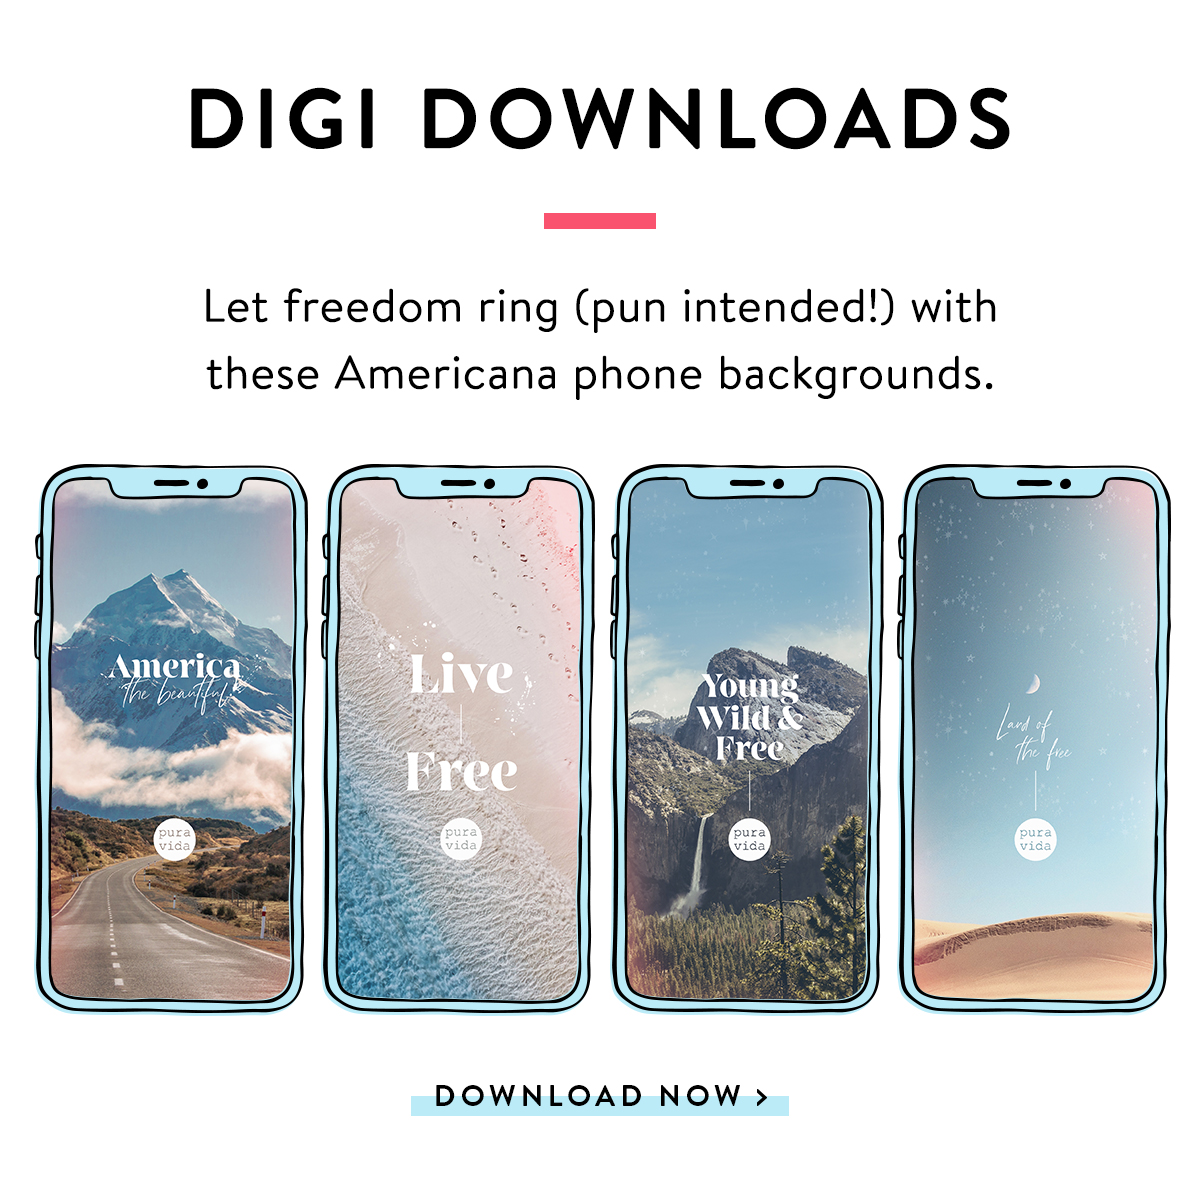 Digi Downloads | DOWNLOAD NOW >